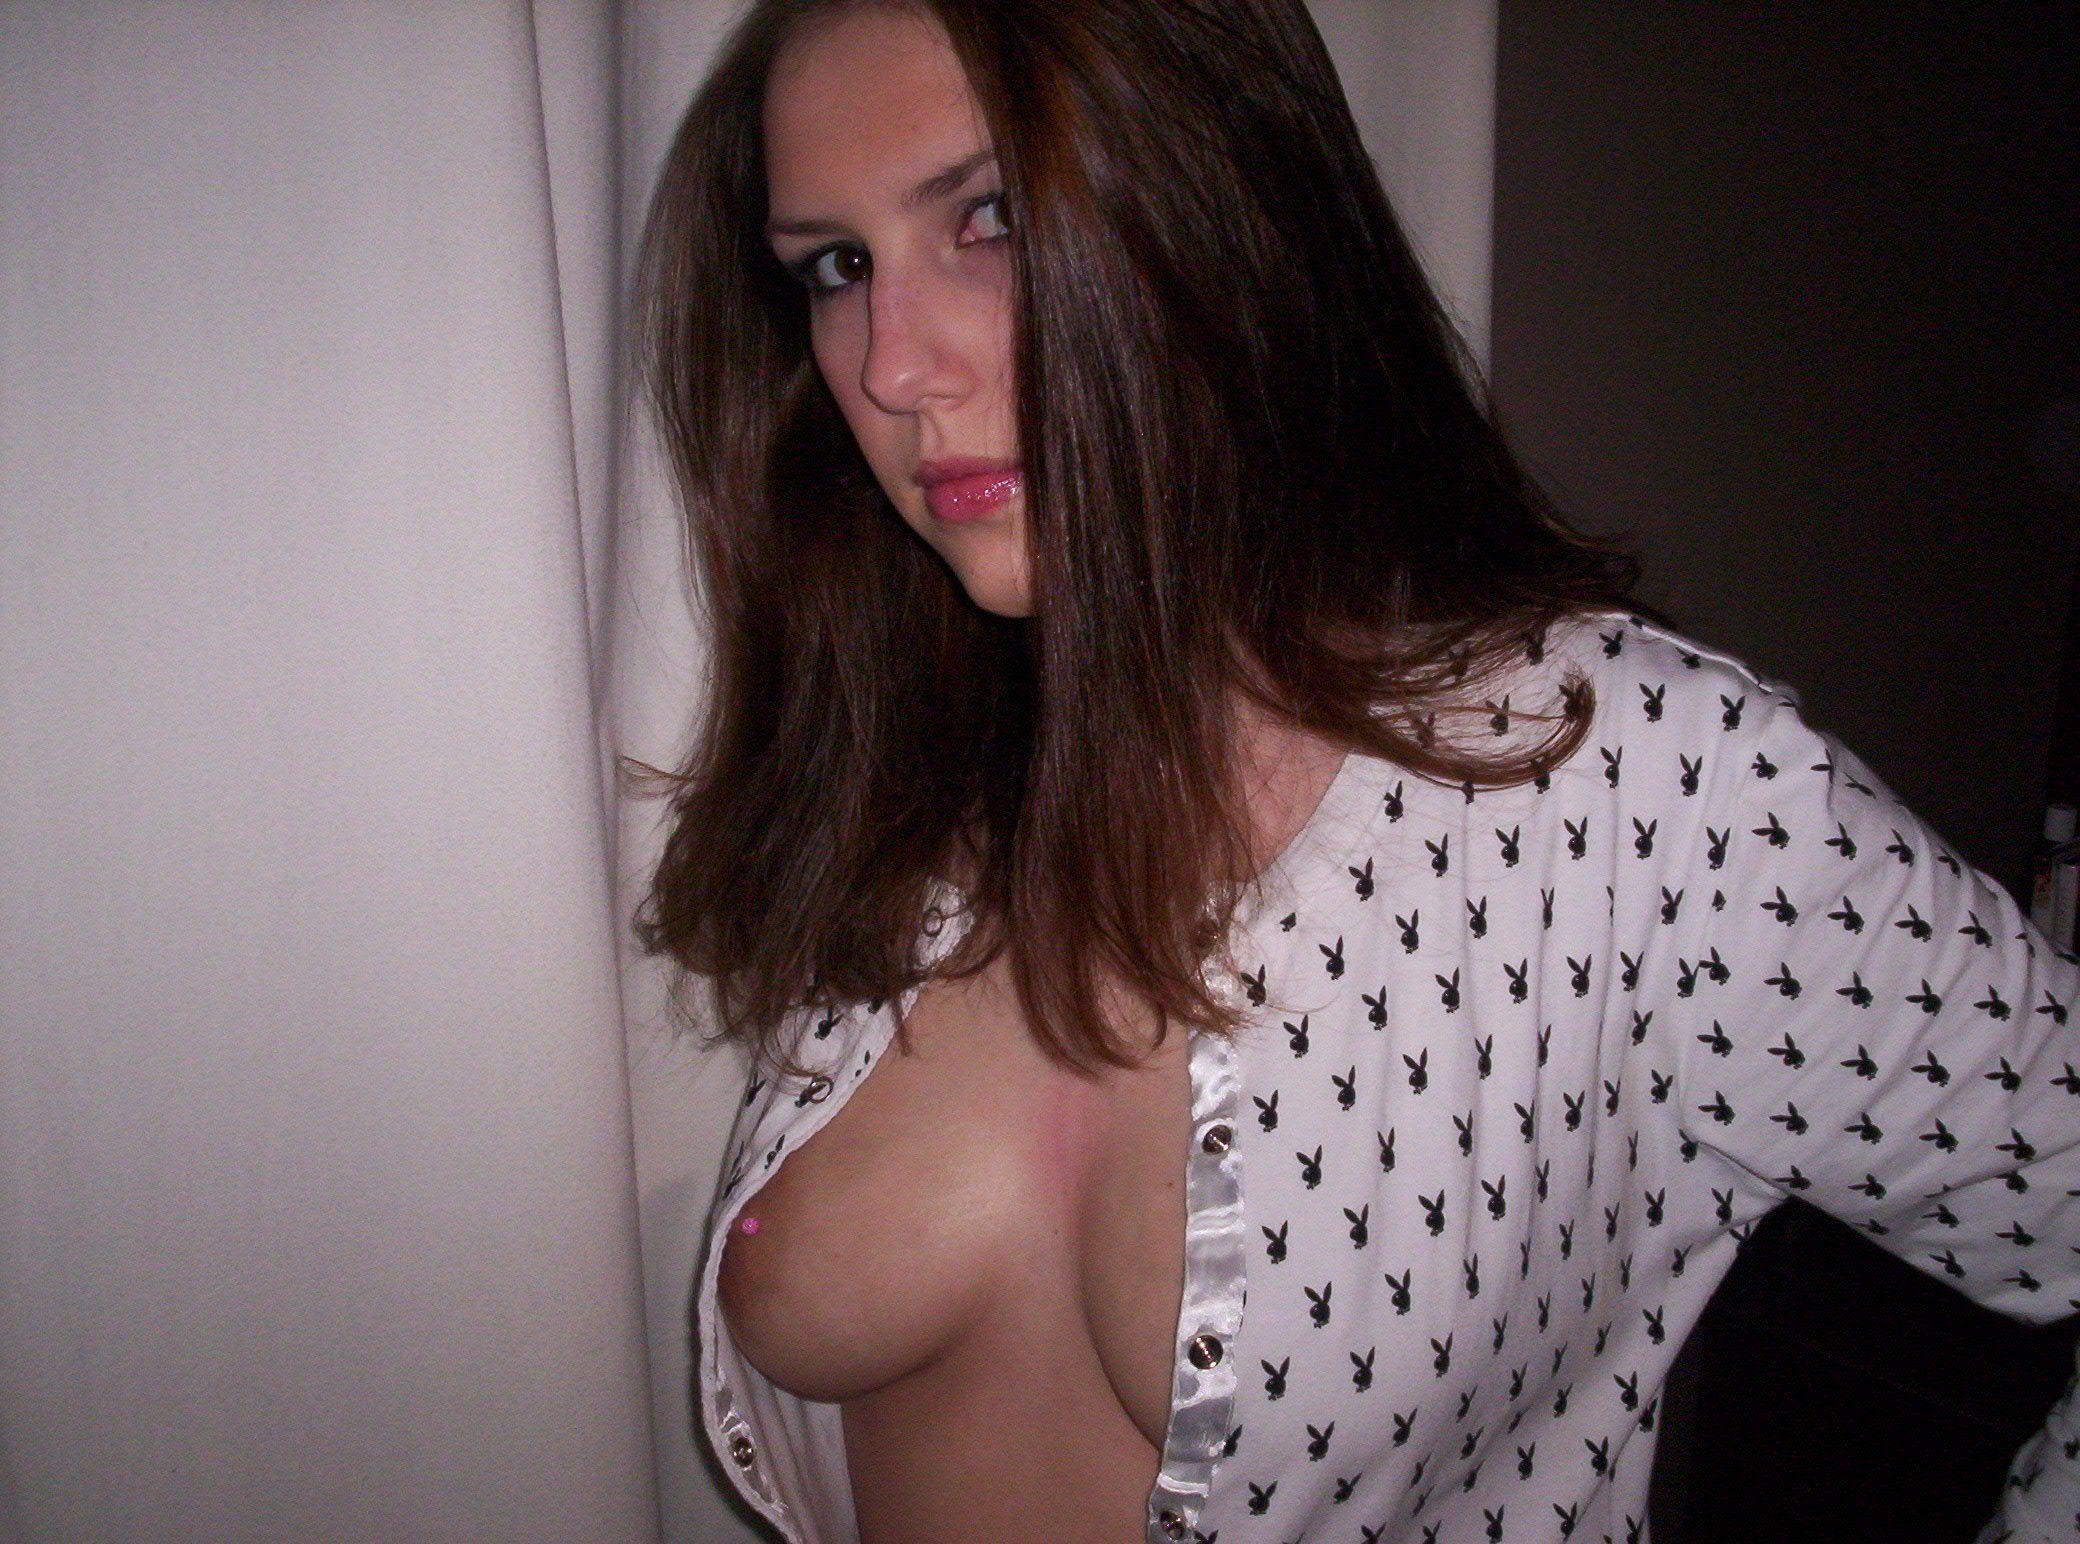 Teen slut pierced nipples